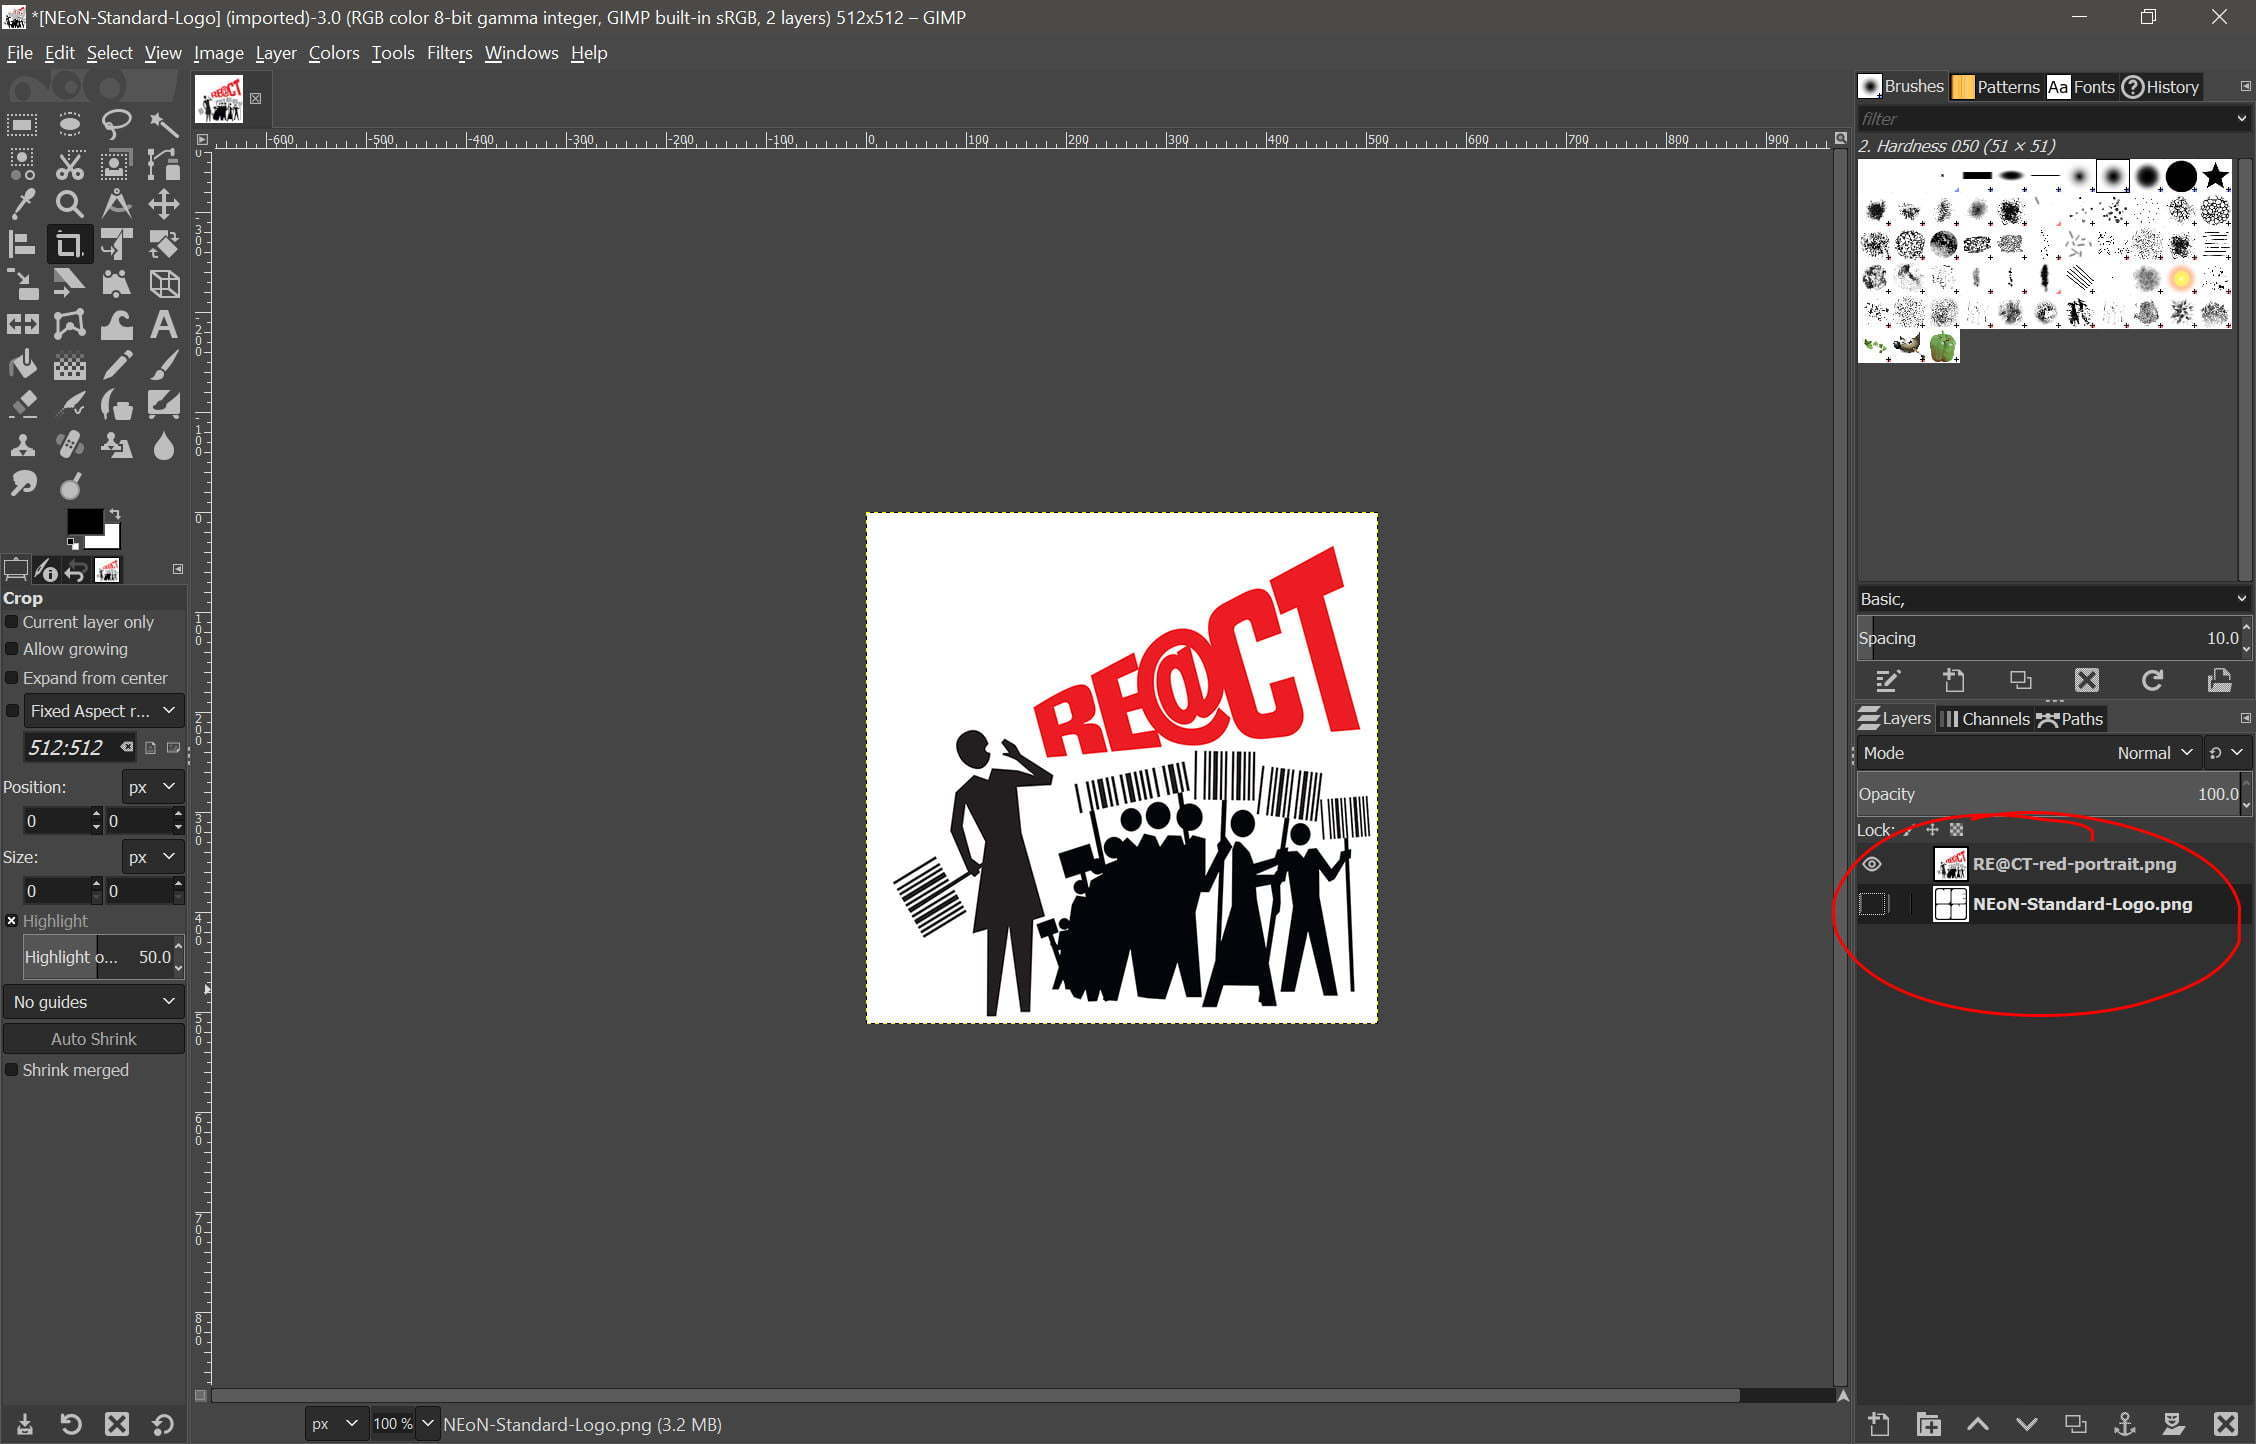 How to make a GIF using GIMP software -